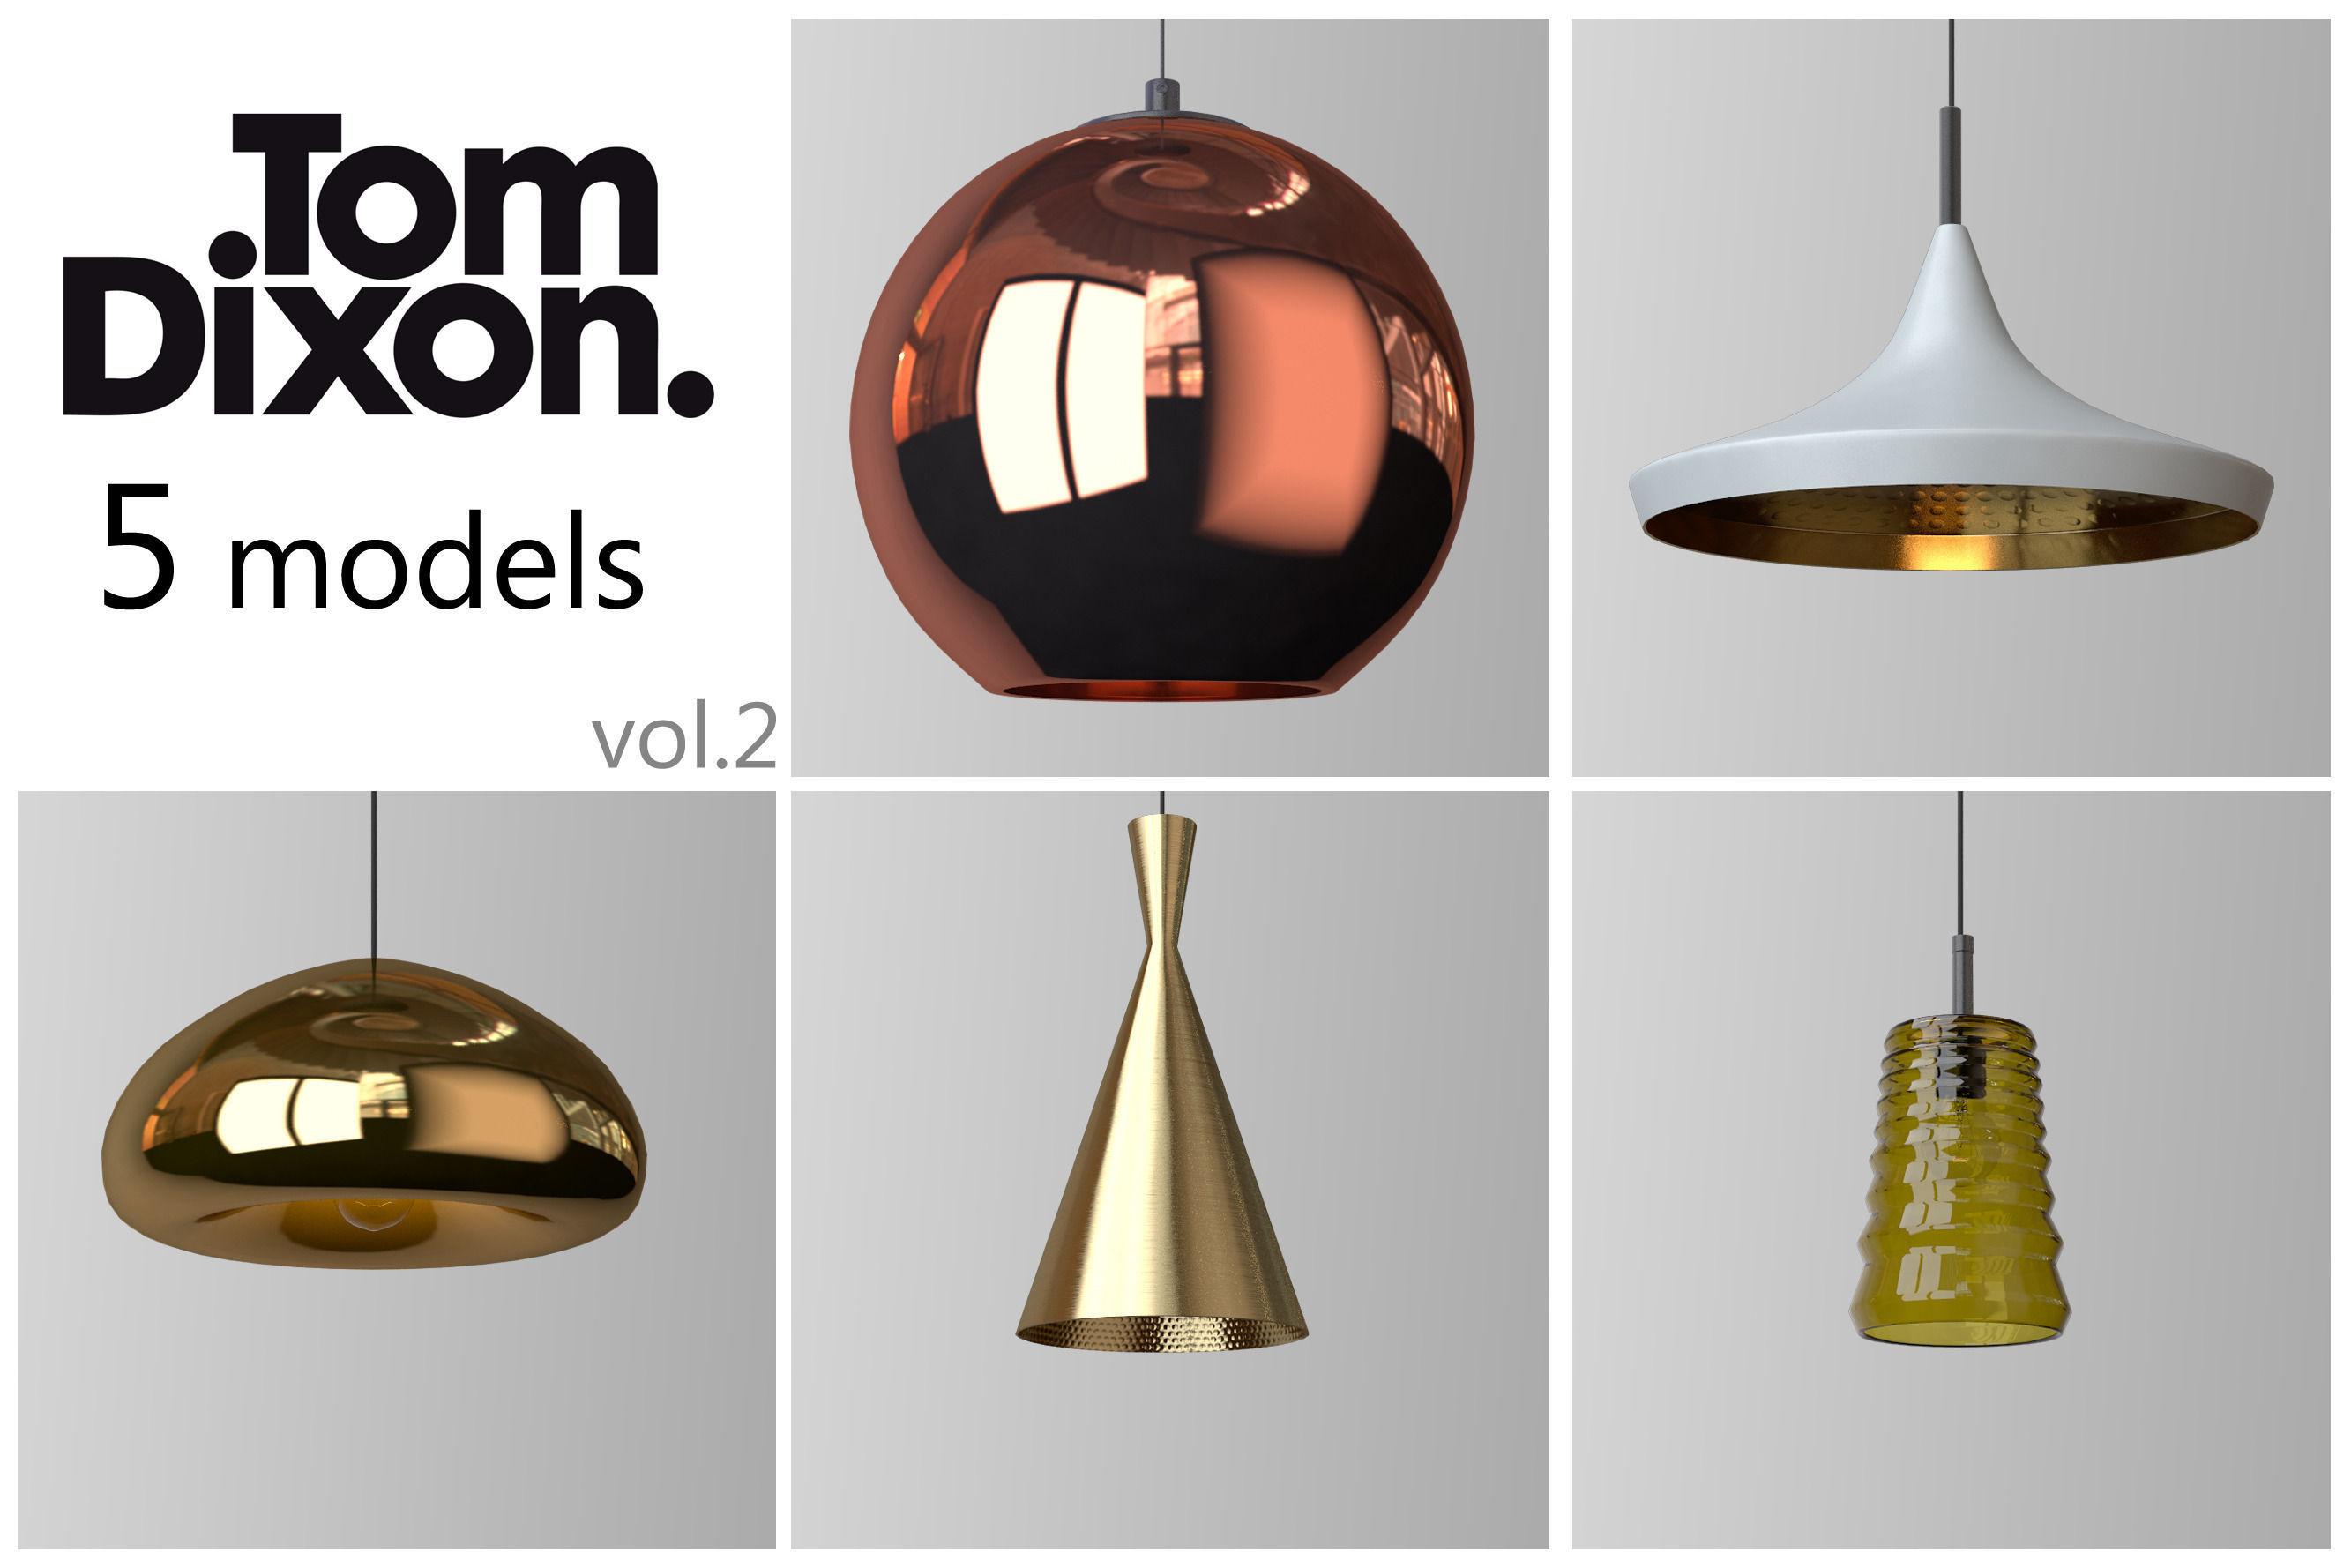 tom dixon lighting set  d model max obj - tom dixon lighting set  d model max obj